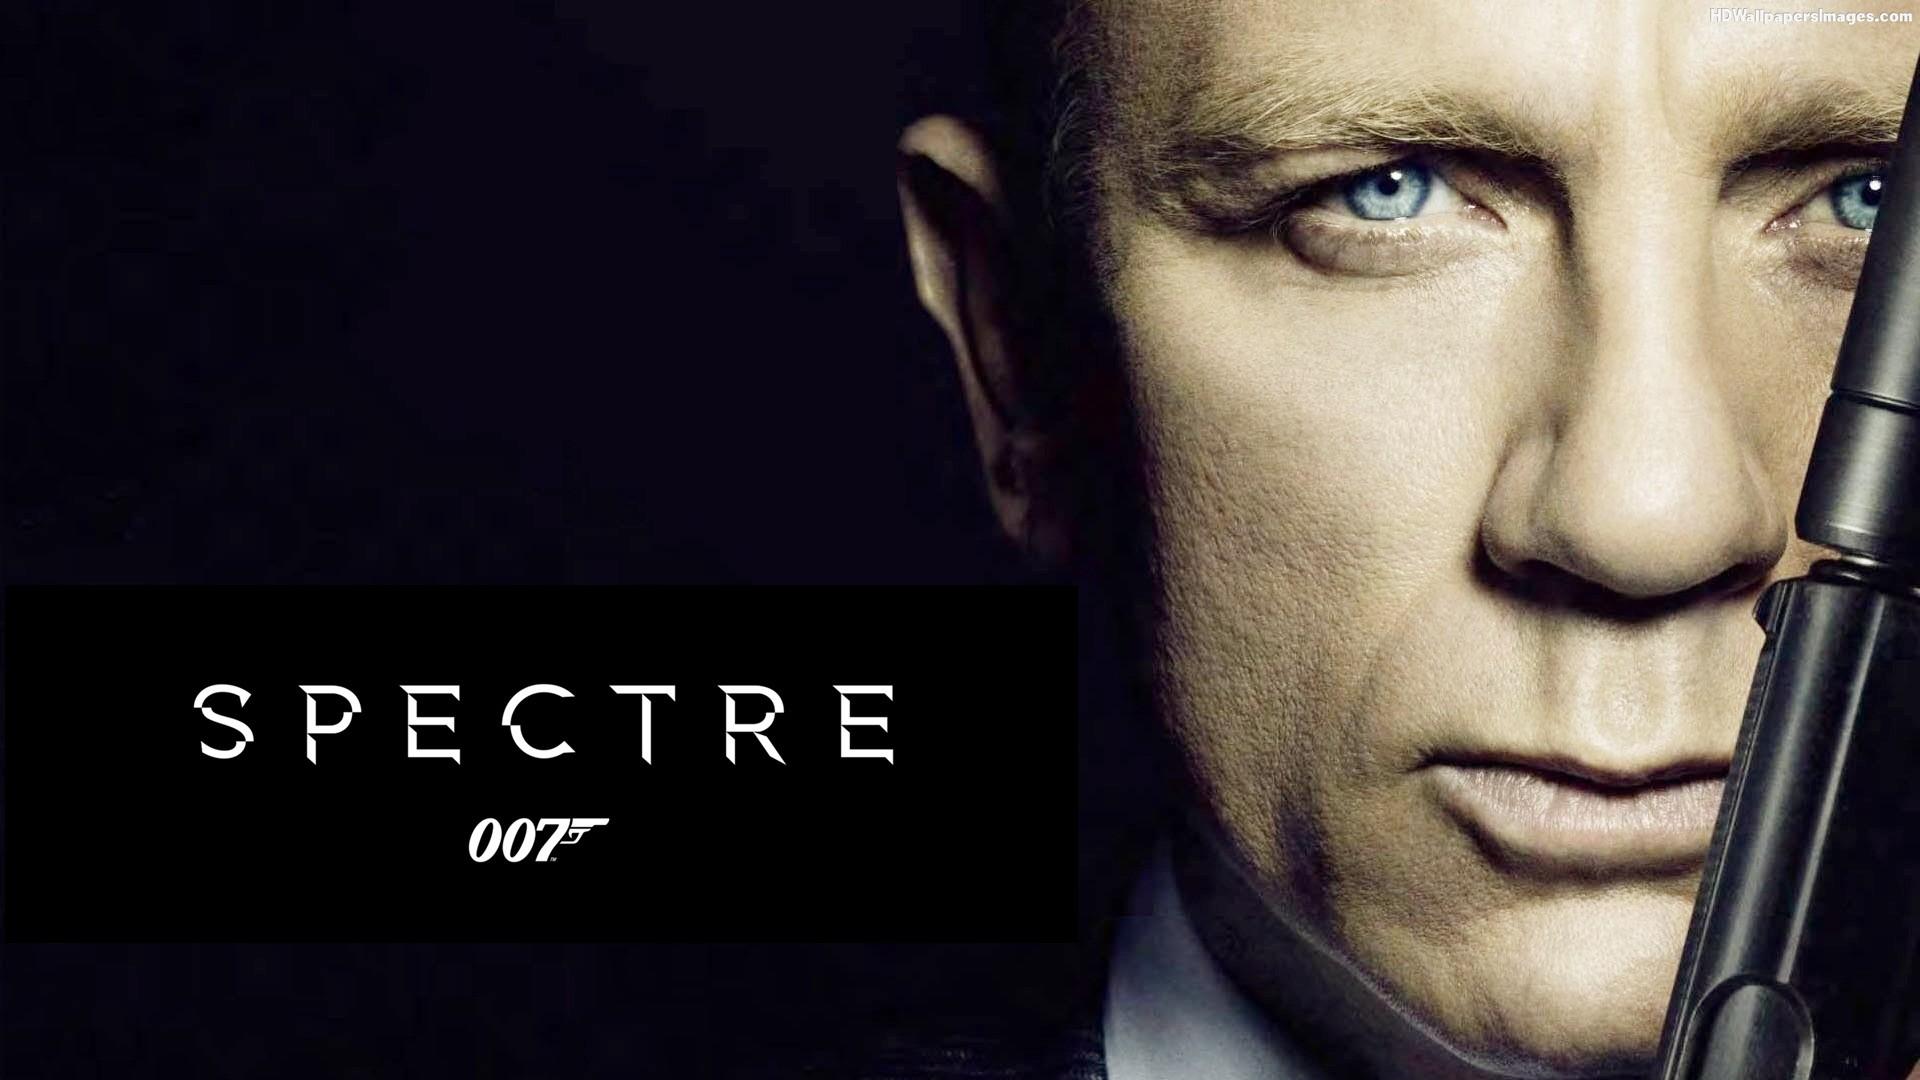 James Bond Spectre Wallpaper - WallpaperSafari